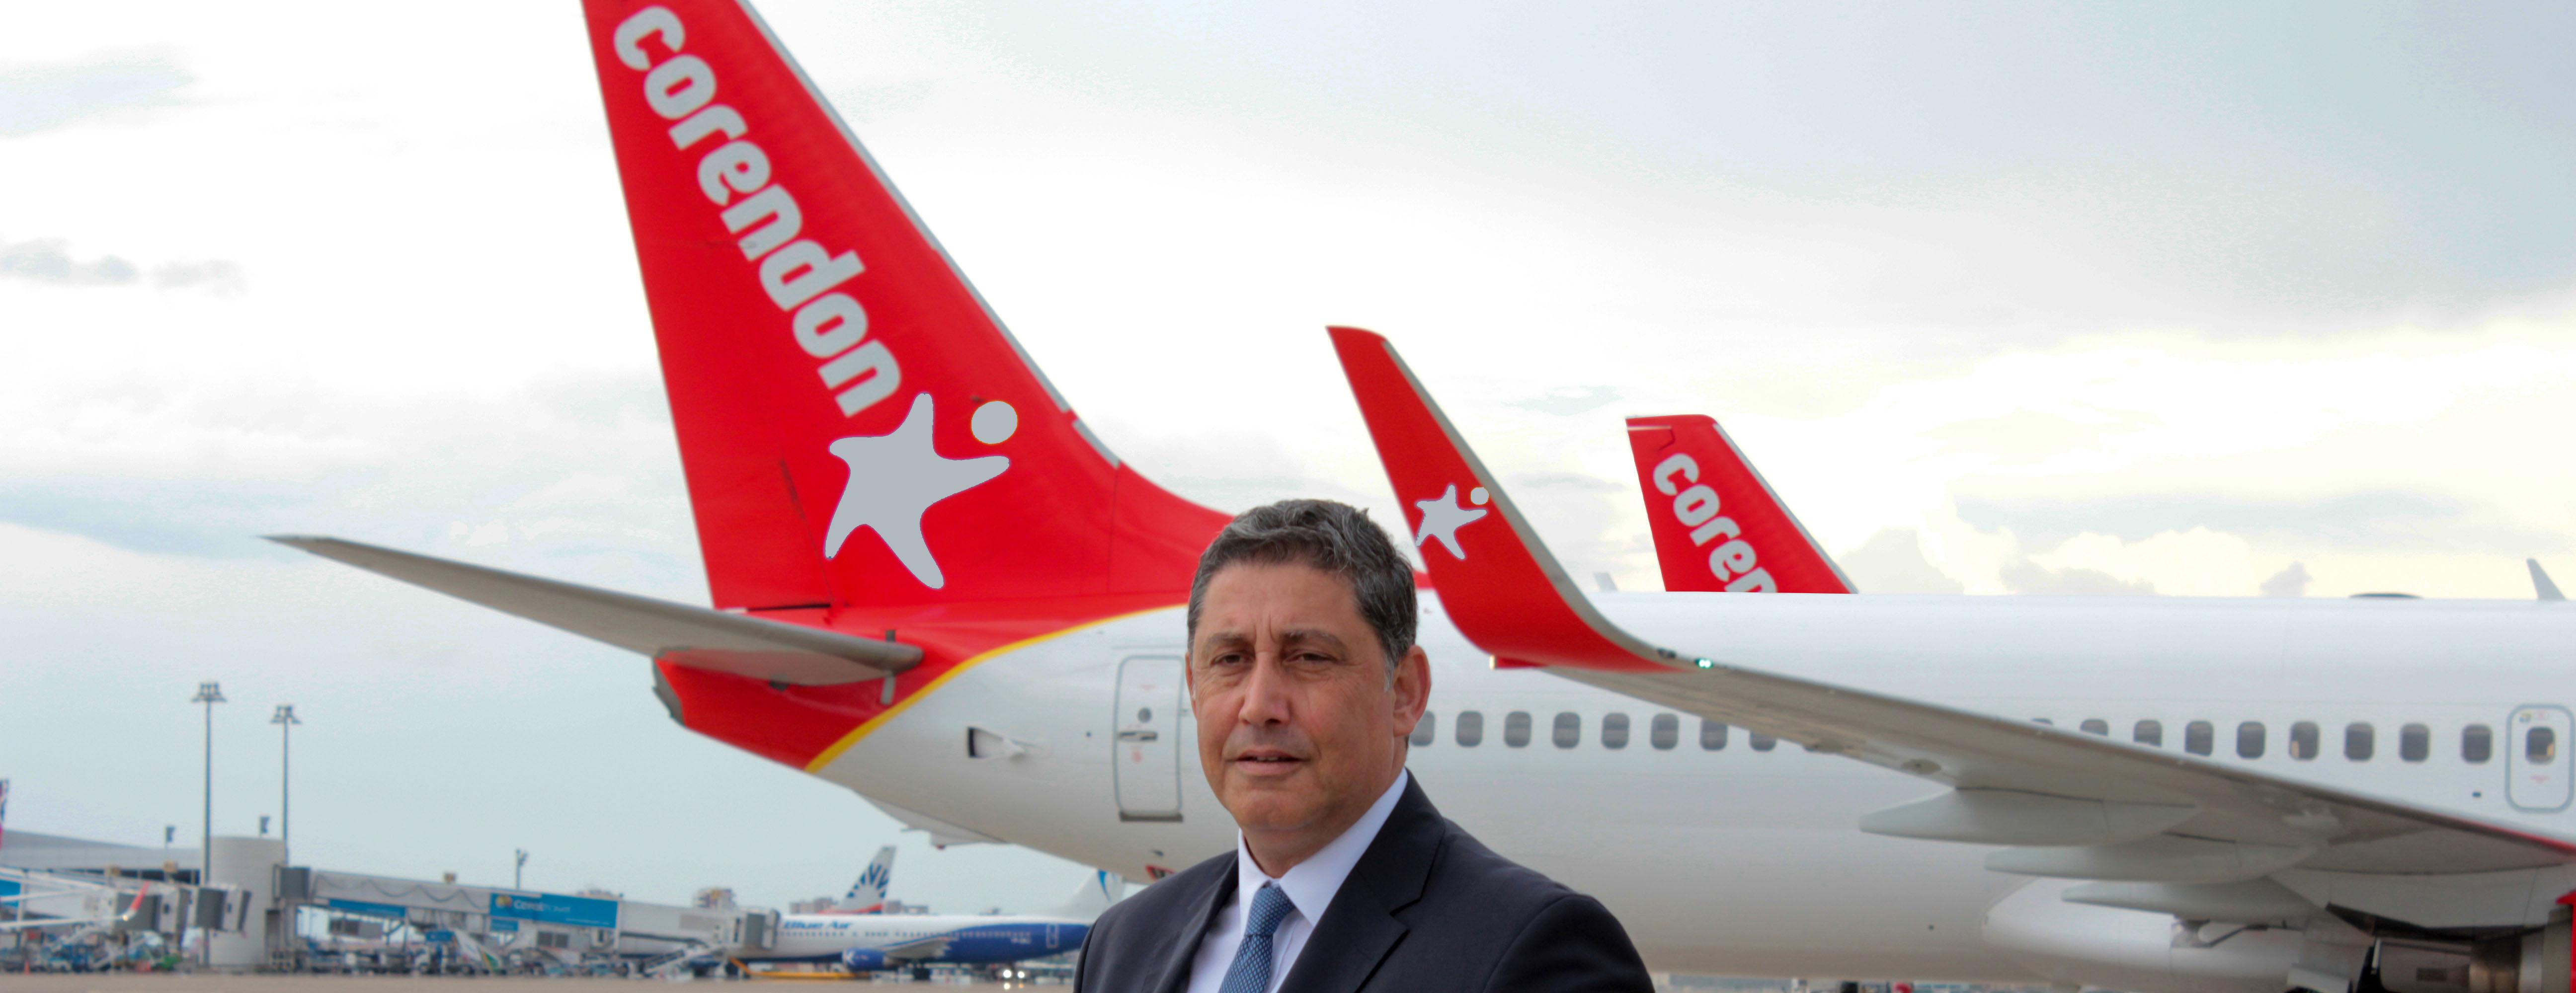 Corendon Airlines jet hızıyla büyüyor